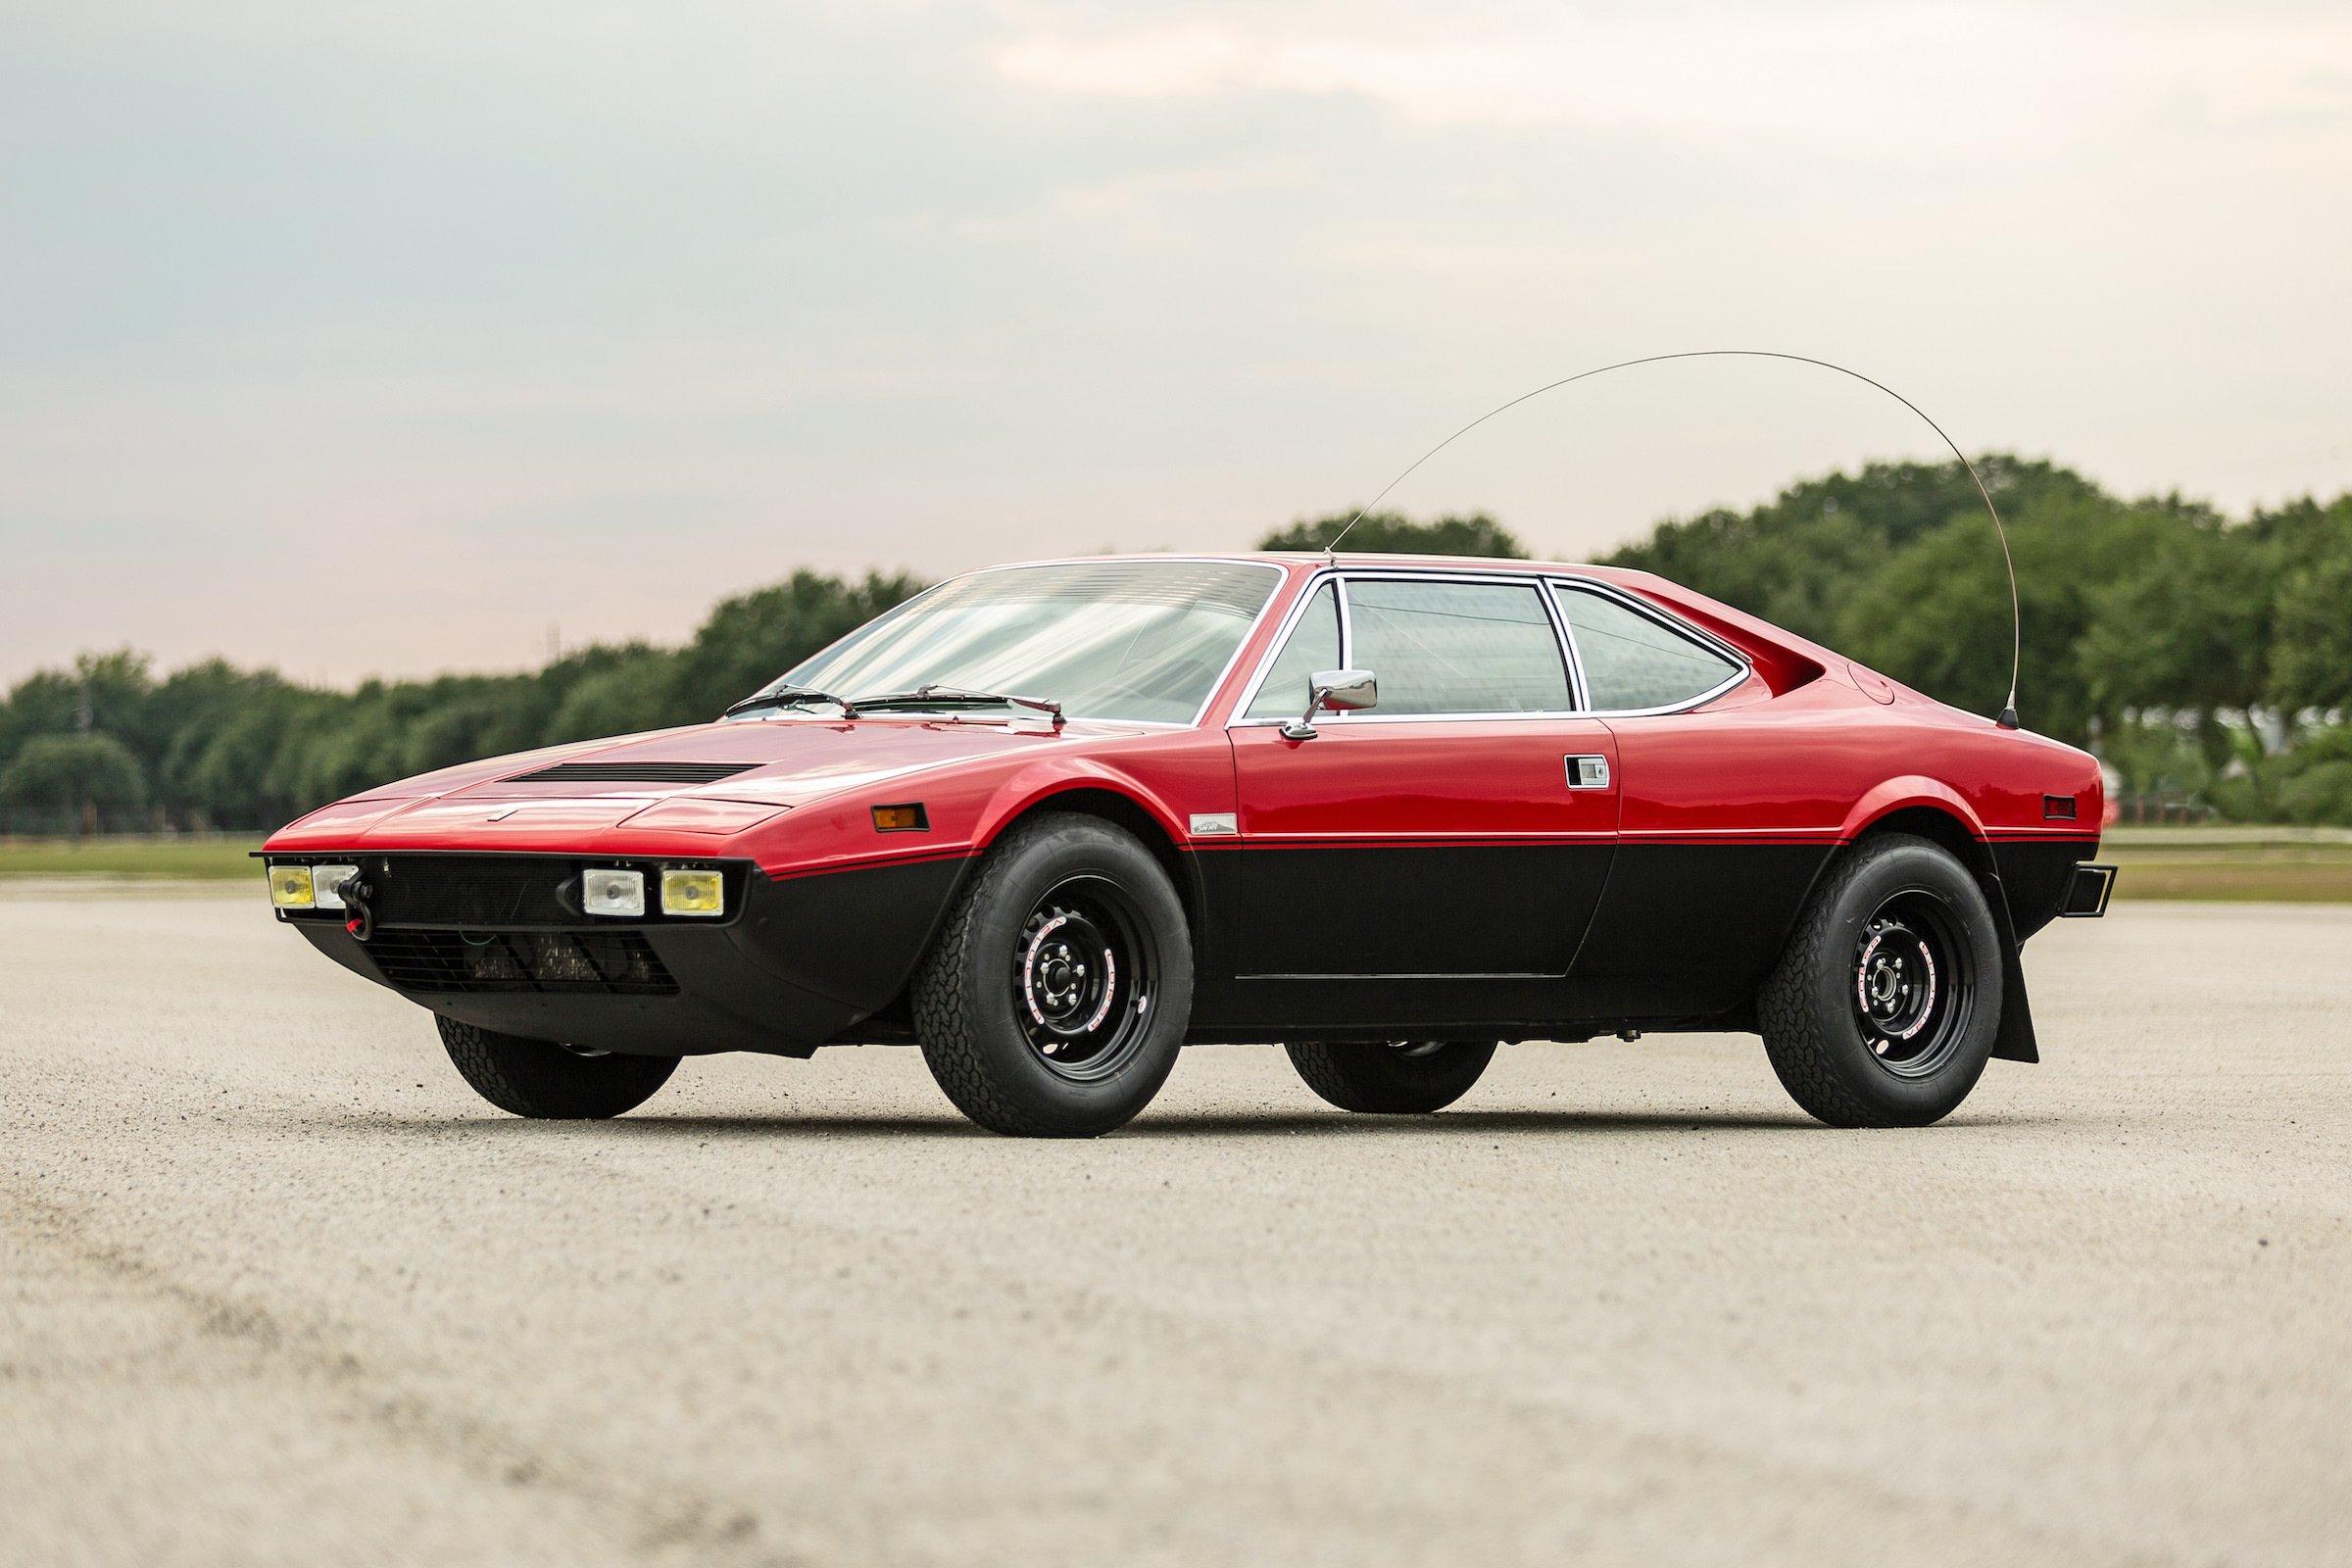 1975 Ferrari Dino 308 Gt4 Safari A Gentleman S Sport Utility Vehicle